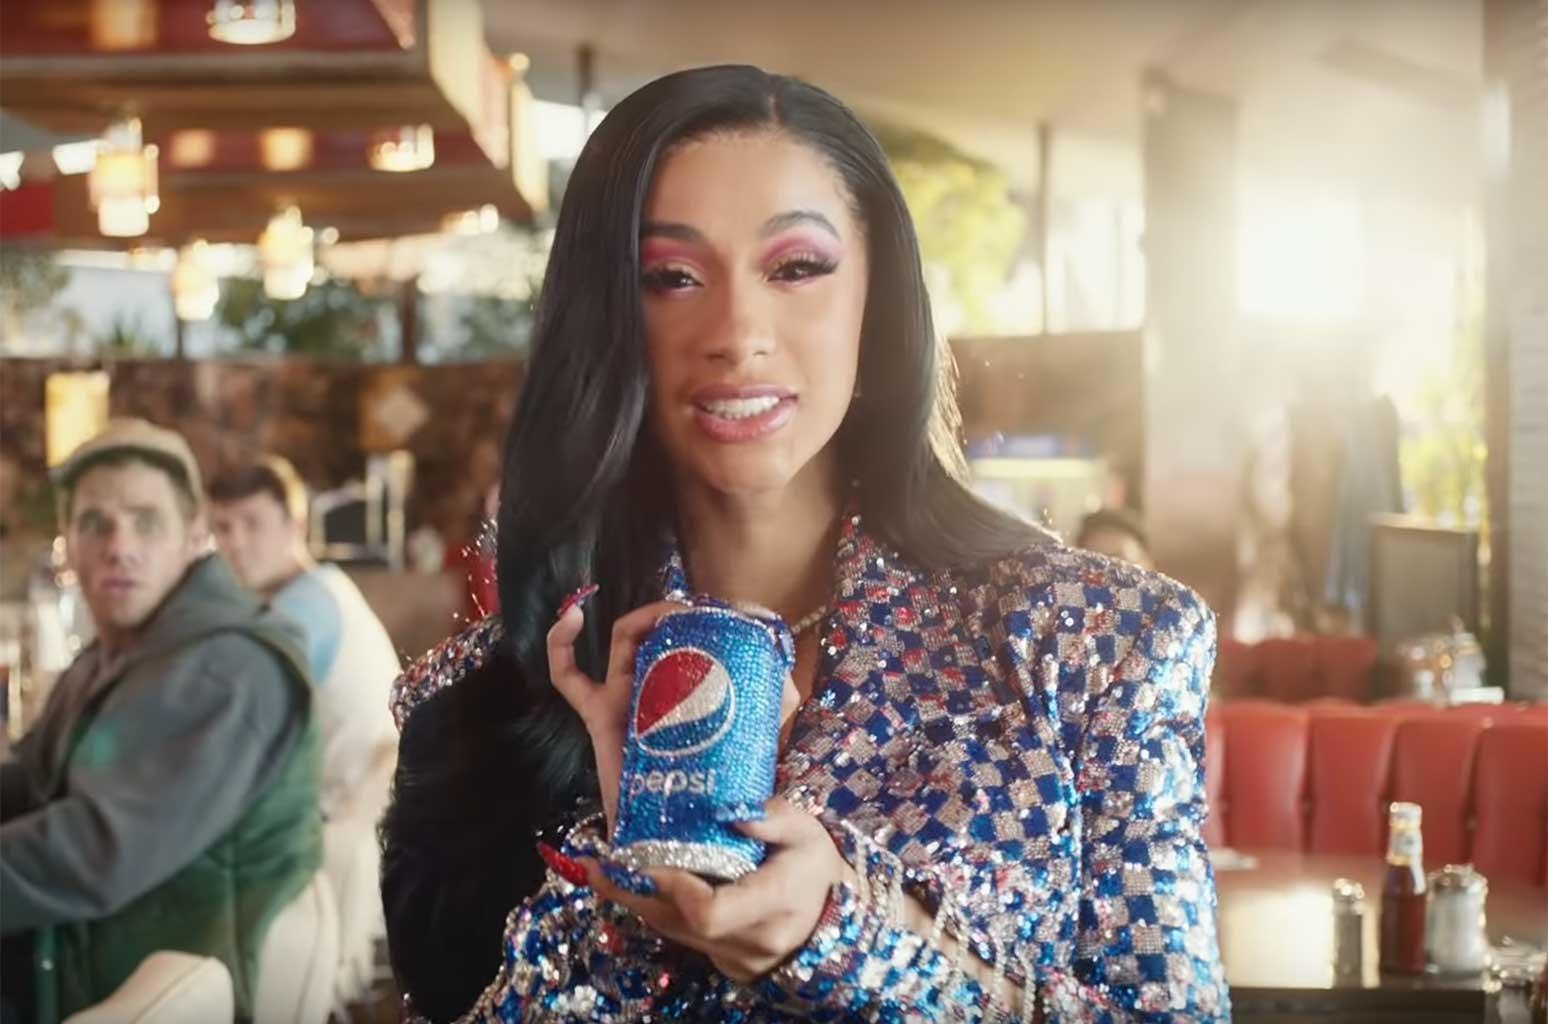 Cardi B, Lil Jon & Steve Carrell In Pepsi Super Bowl intended for Cardi B Super Bowl 2019